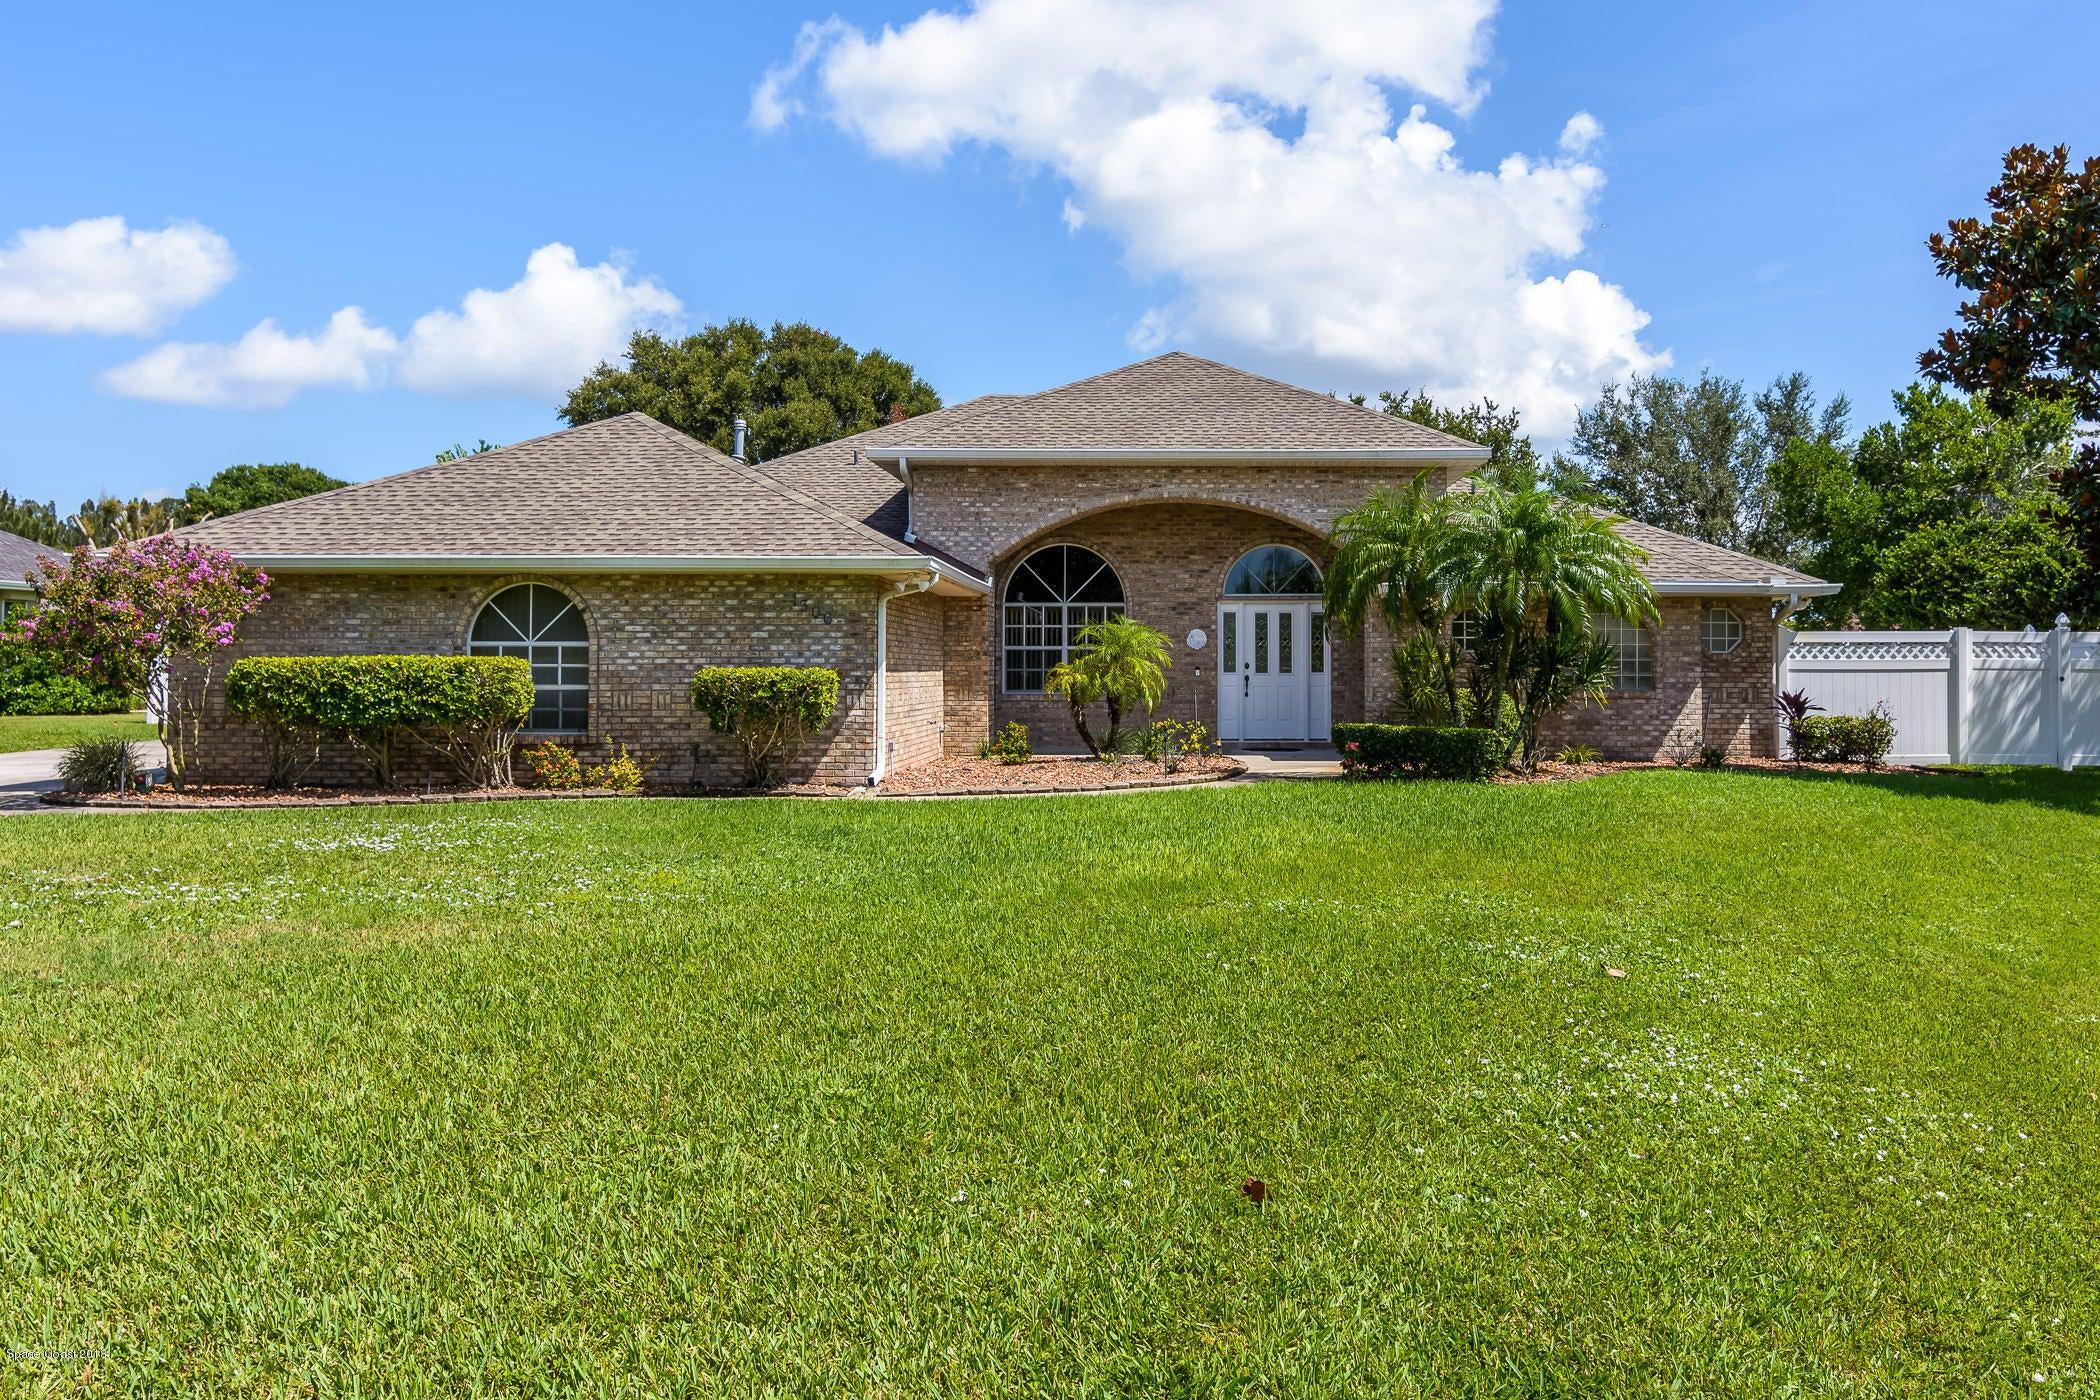 1306 Avalon Drive, 0, Rockledge, FL 32955